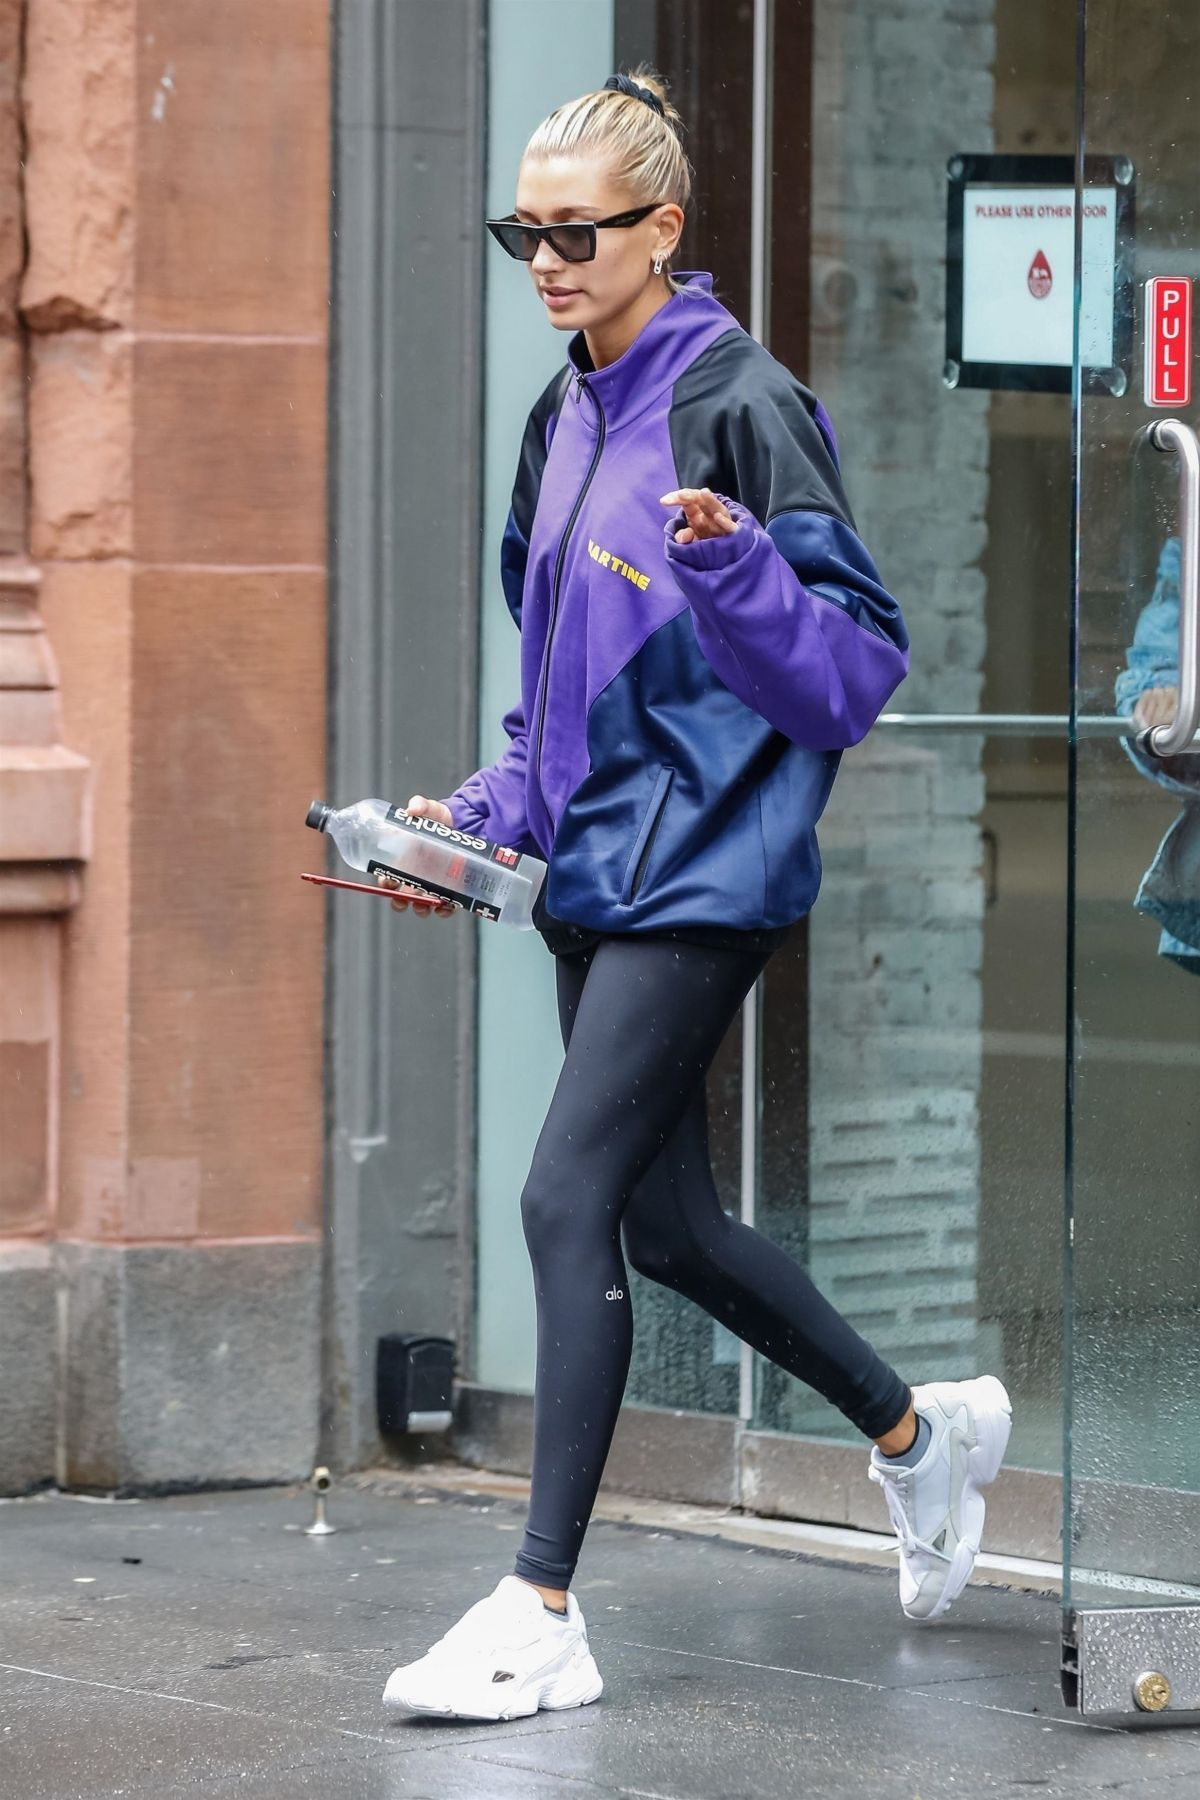 3498f304294282 Hailey Baldwin Leaves Starbucks in New York 08/13/2018. #summerstyle  #celebrity #fashion #celebrityfashion #celebritystyle #celebritystreetstyle  ...